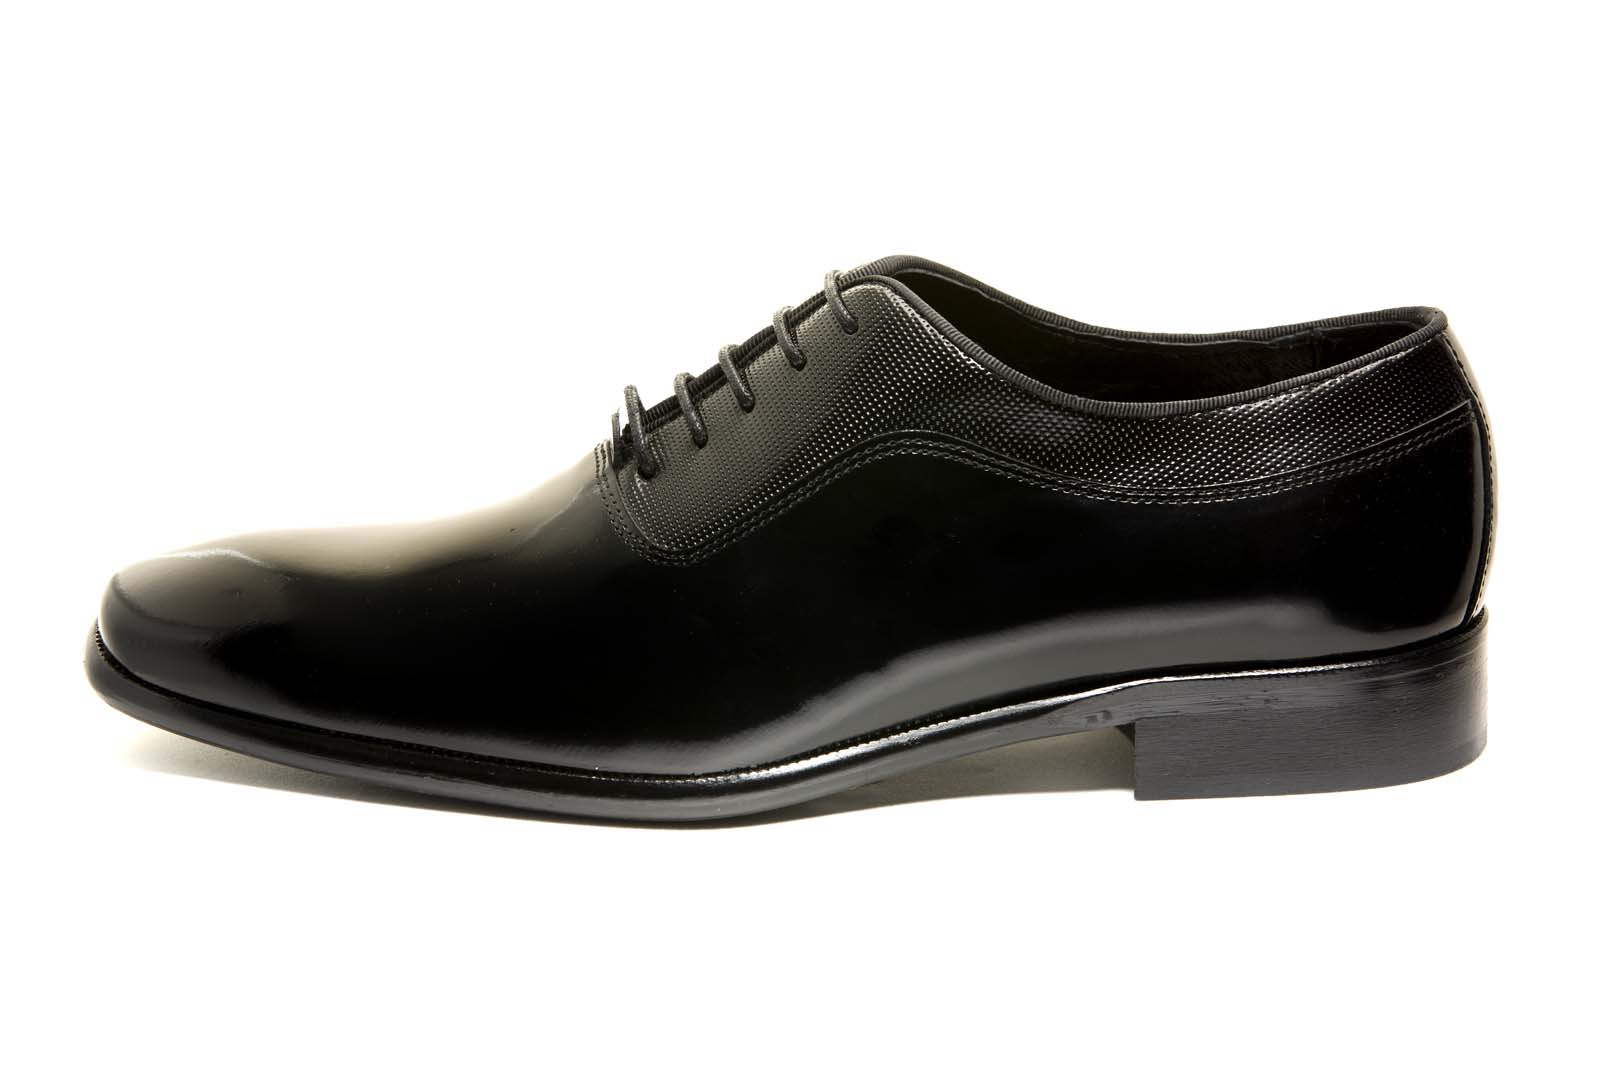 Zapato modelo Oxford piel lisa color negro